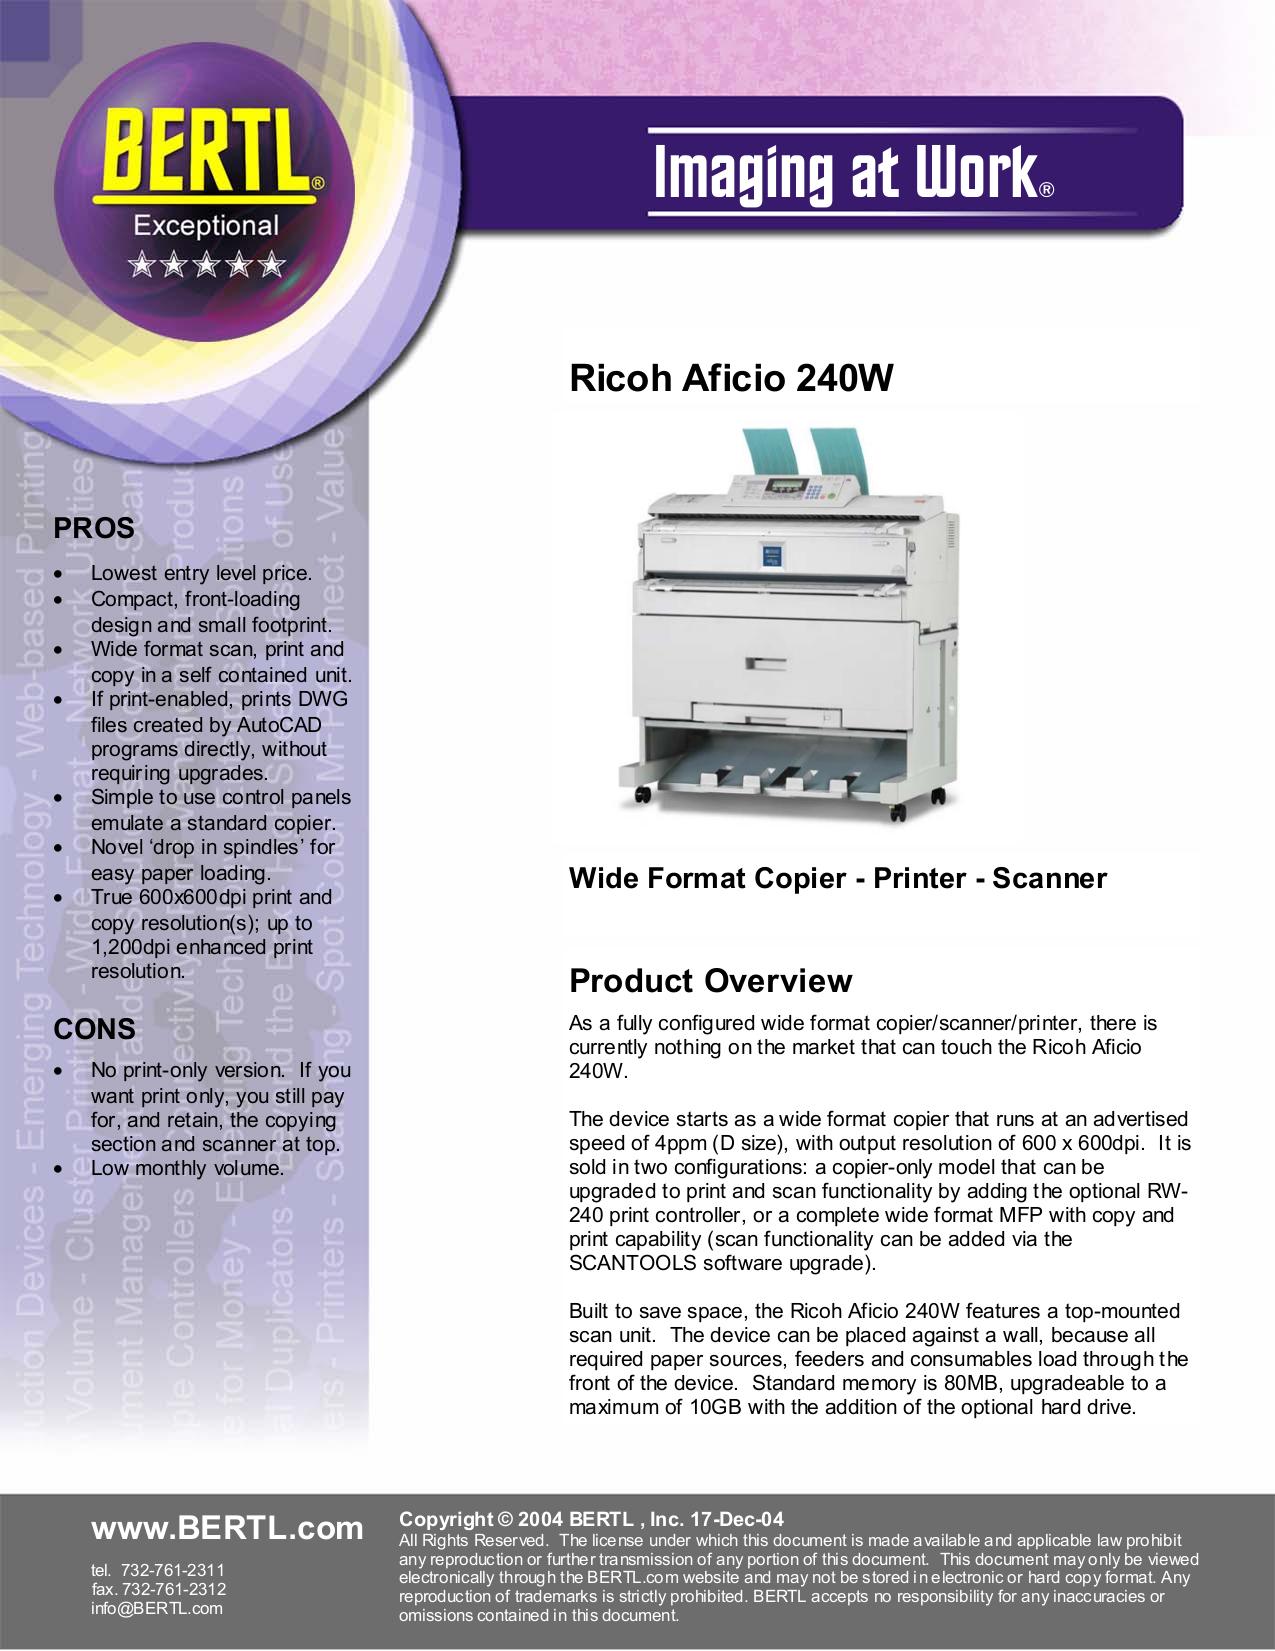 download free pdf for ricoh aficio 240w multifunction printer manual rh umlib com ricoh aficio 240w maintenance manual ricoh aficio 240w user manual